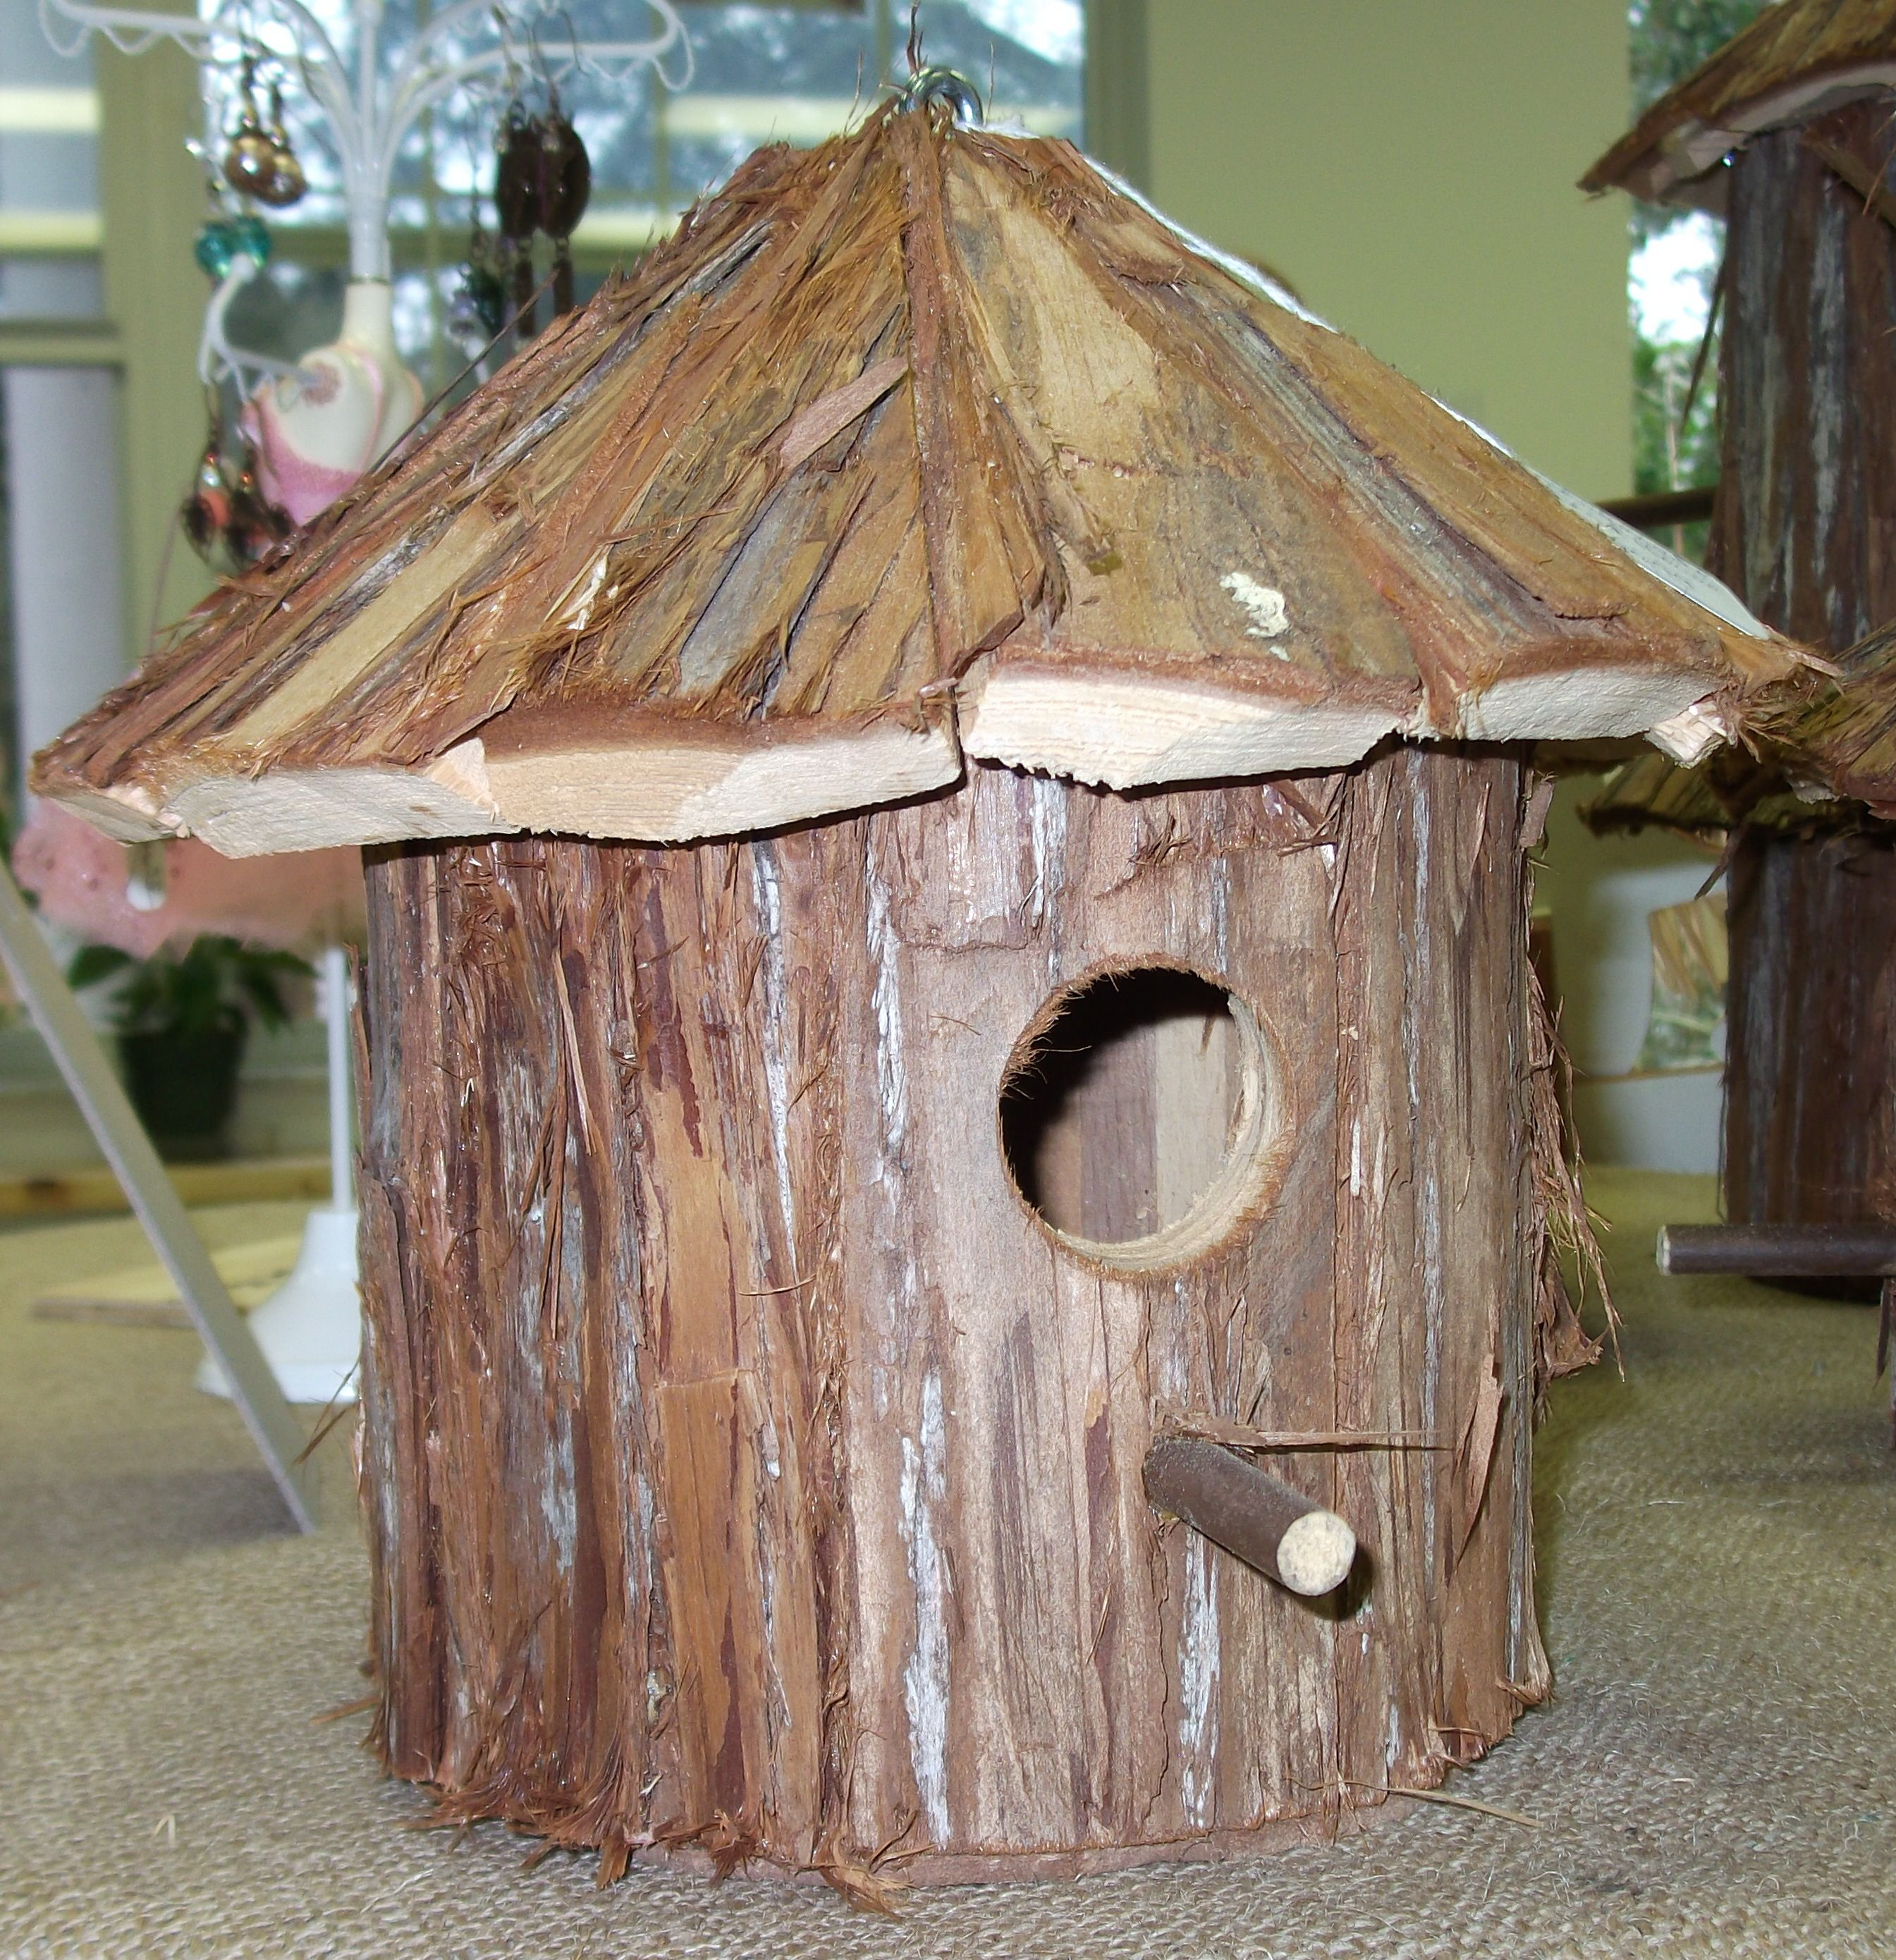 Birdhouse Designs Patterns | Small Birdhouse | Gardening ...